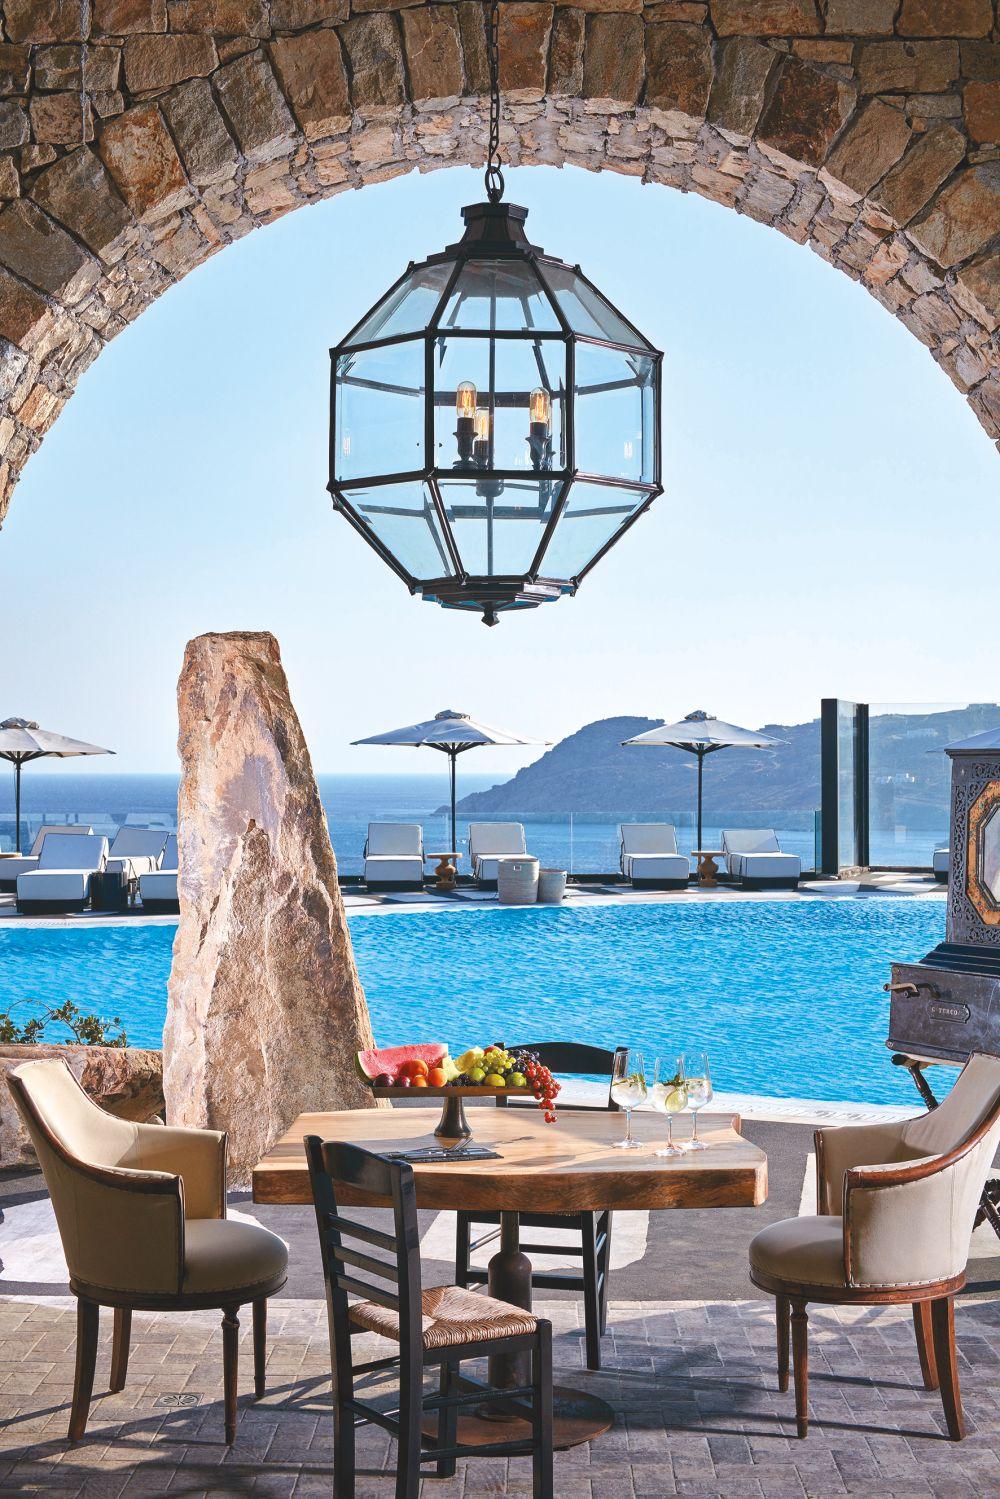 Royal Myconian Resort In Mykonos